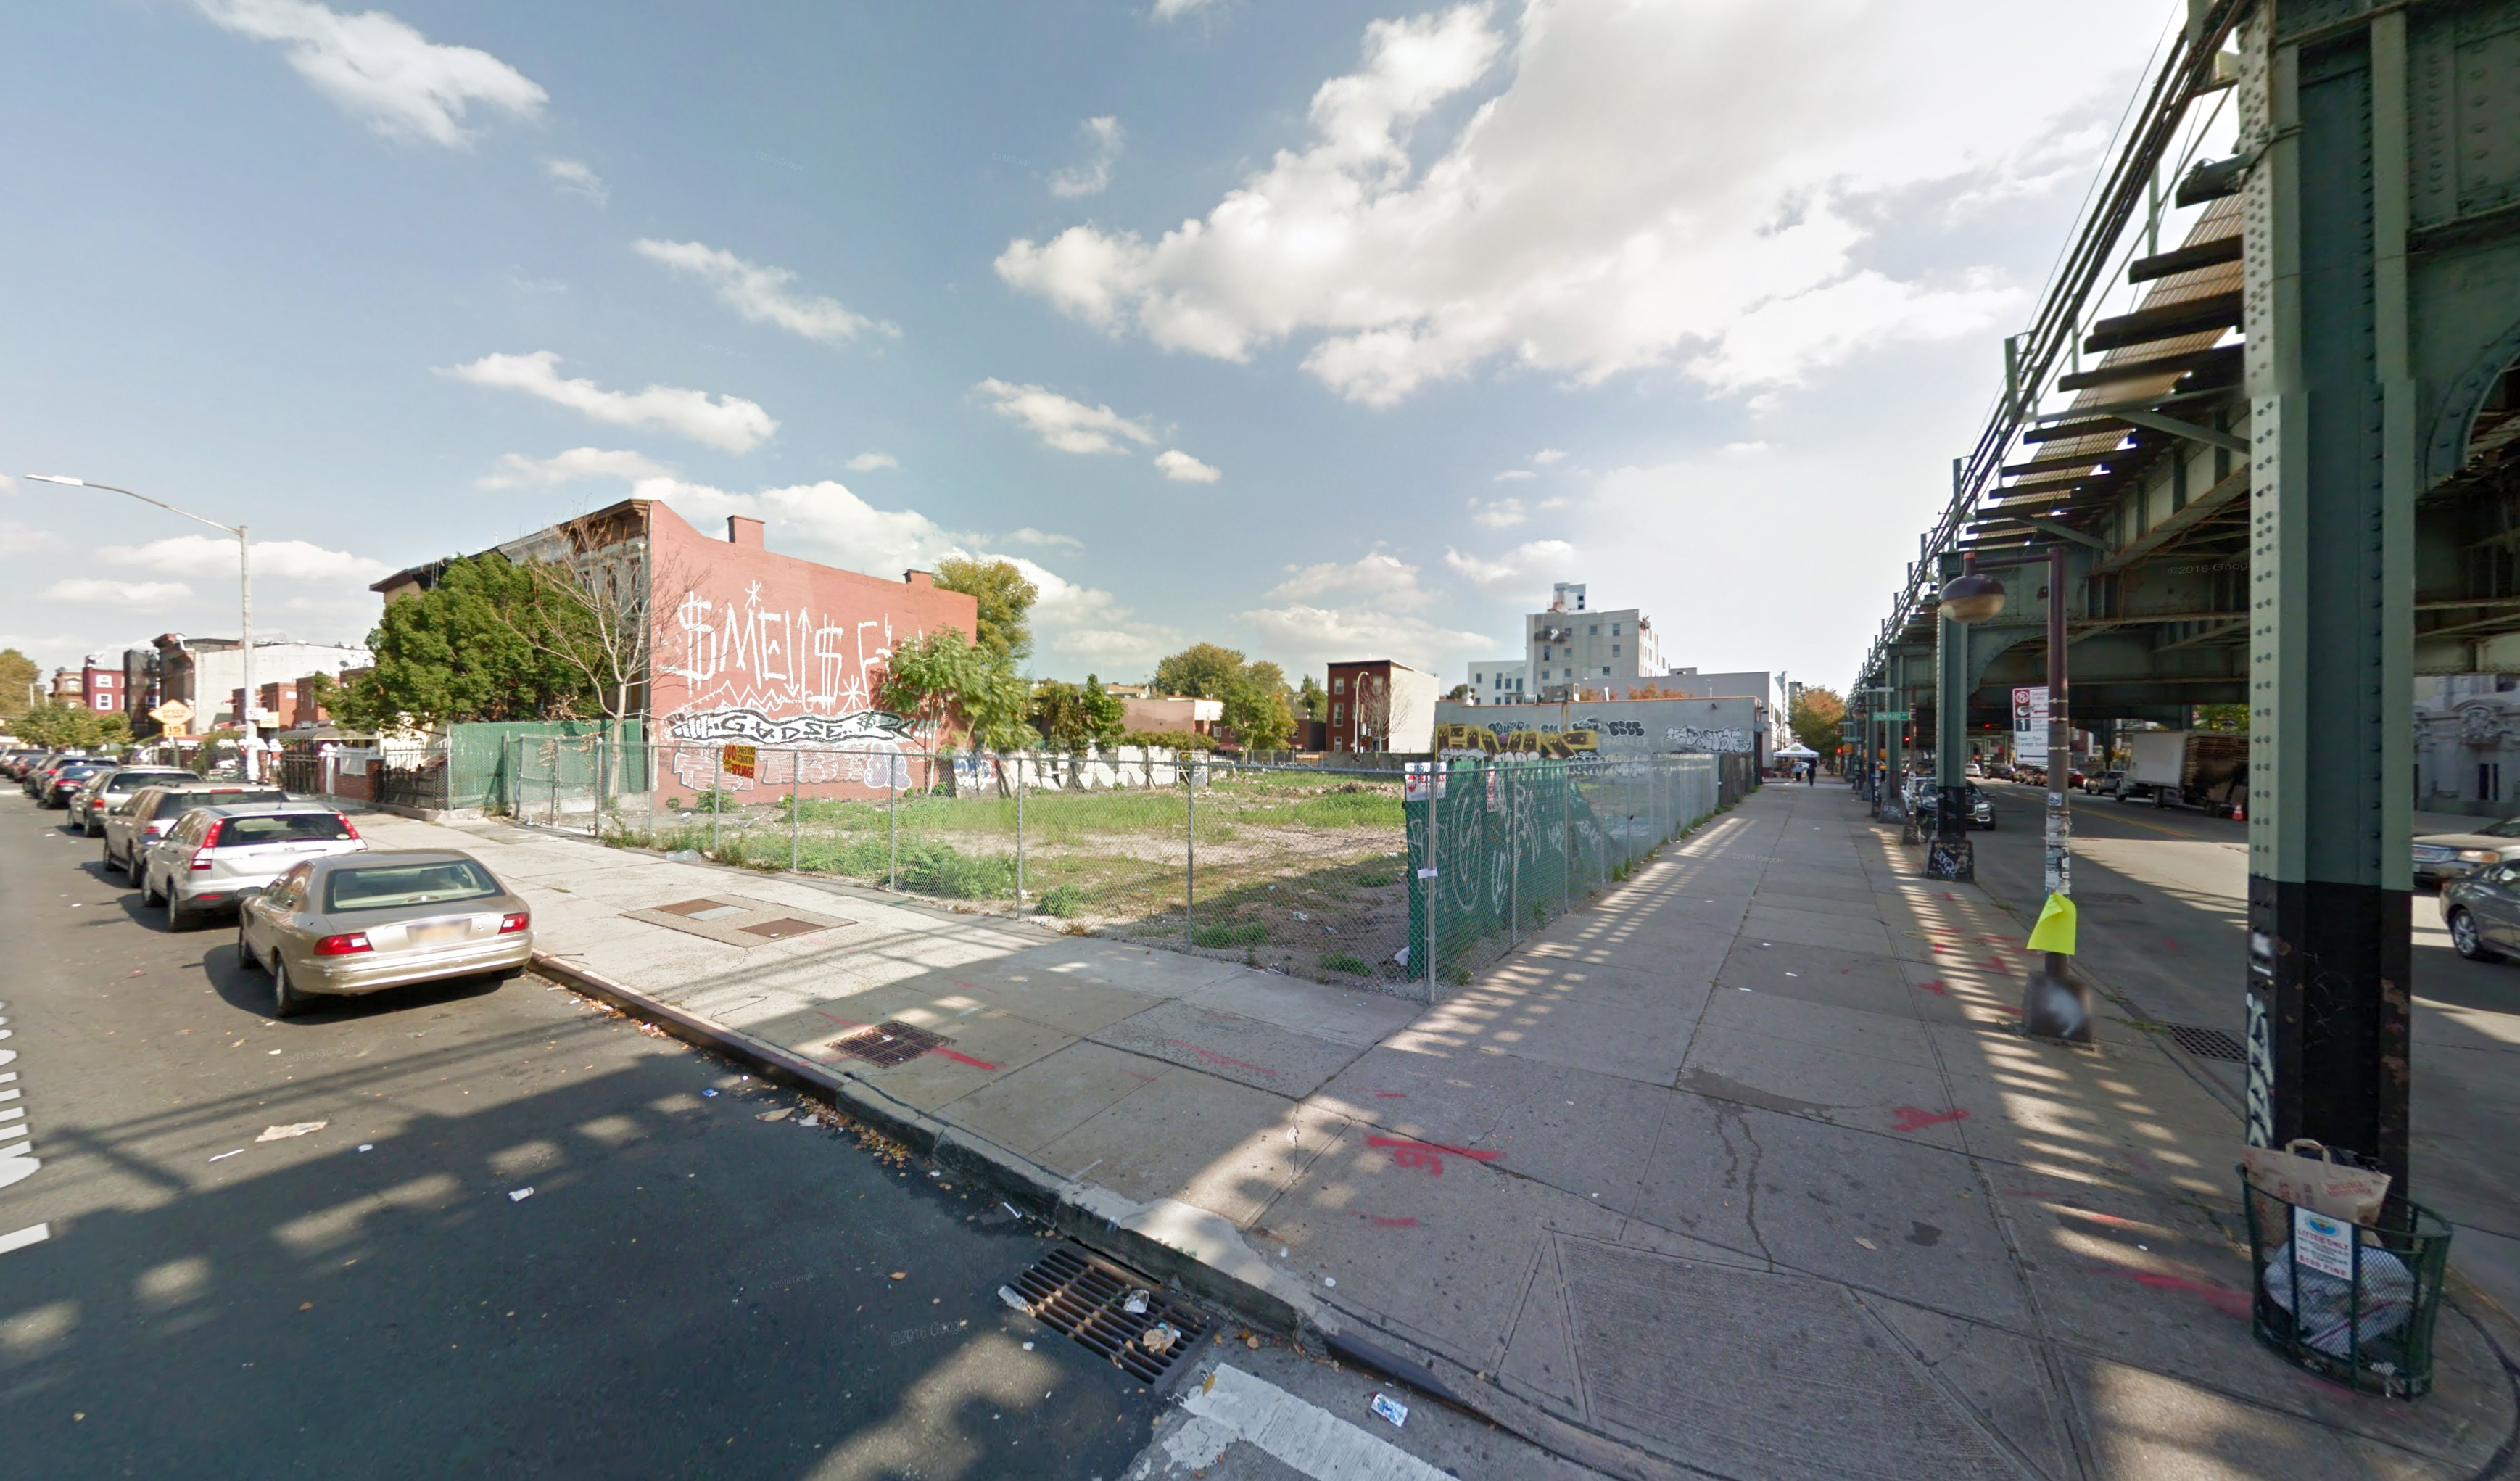 1389 Broadway, via Google Maps